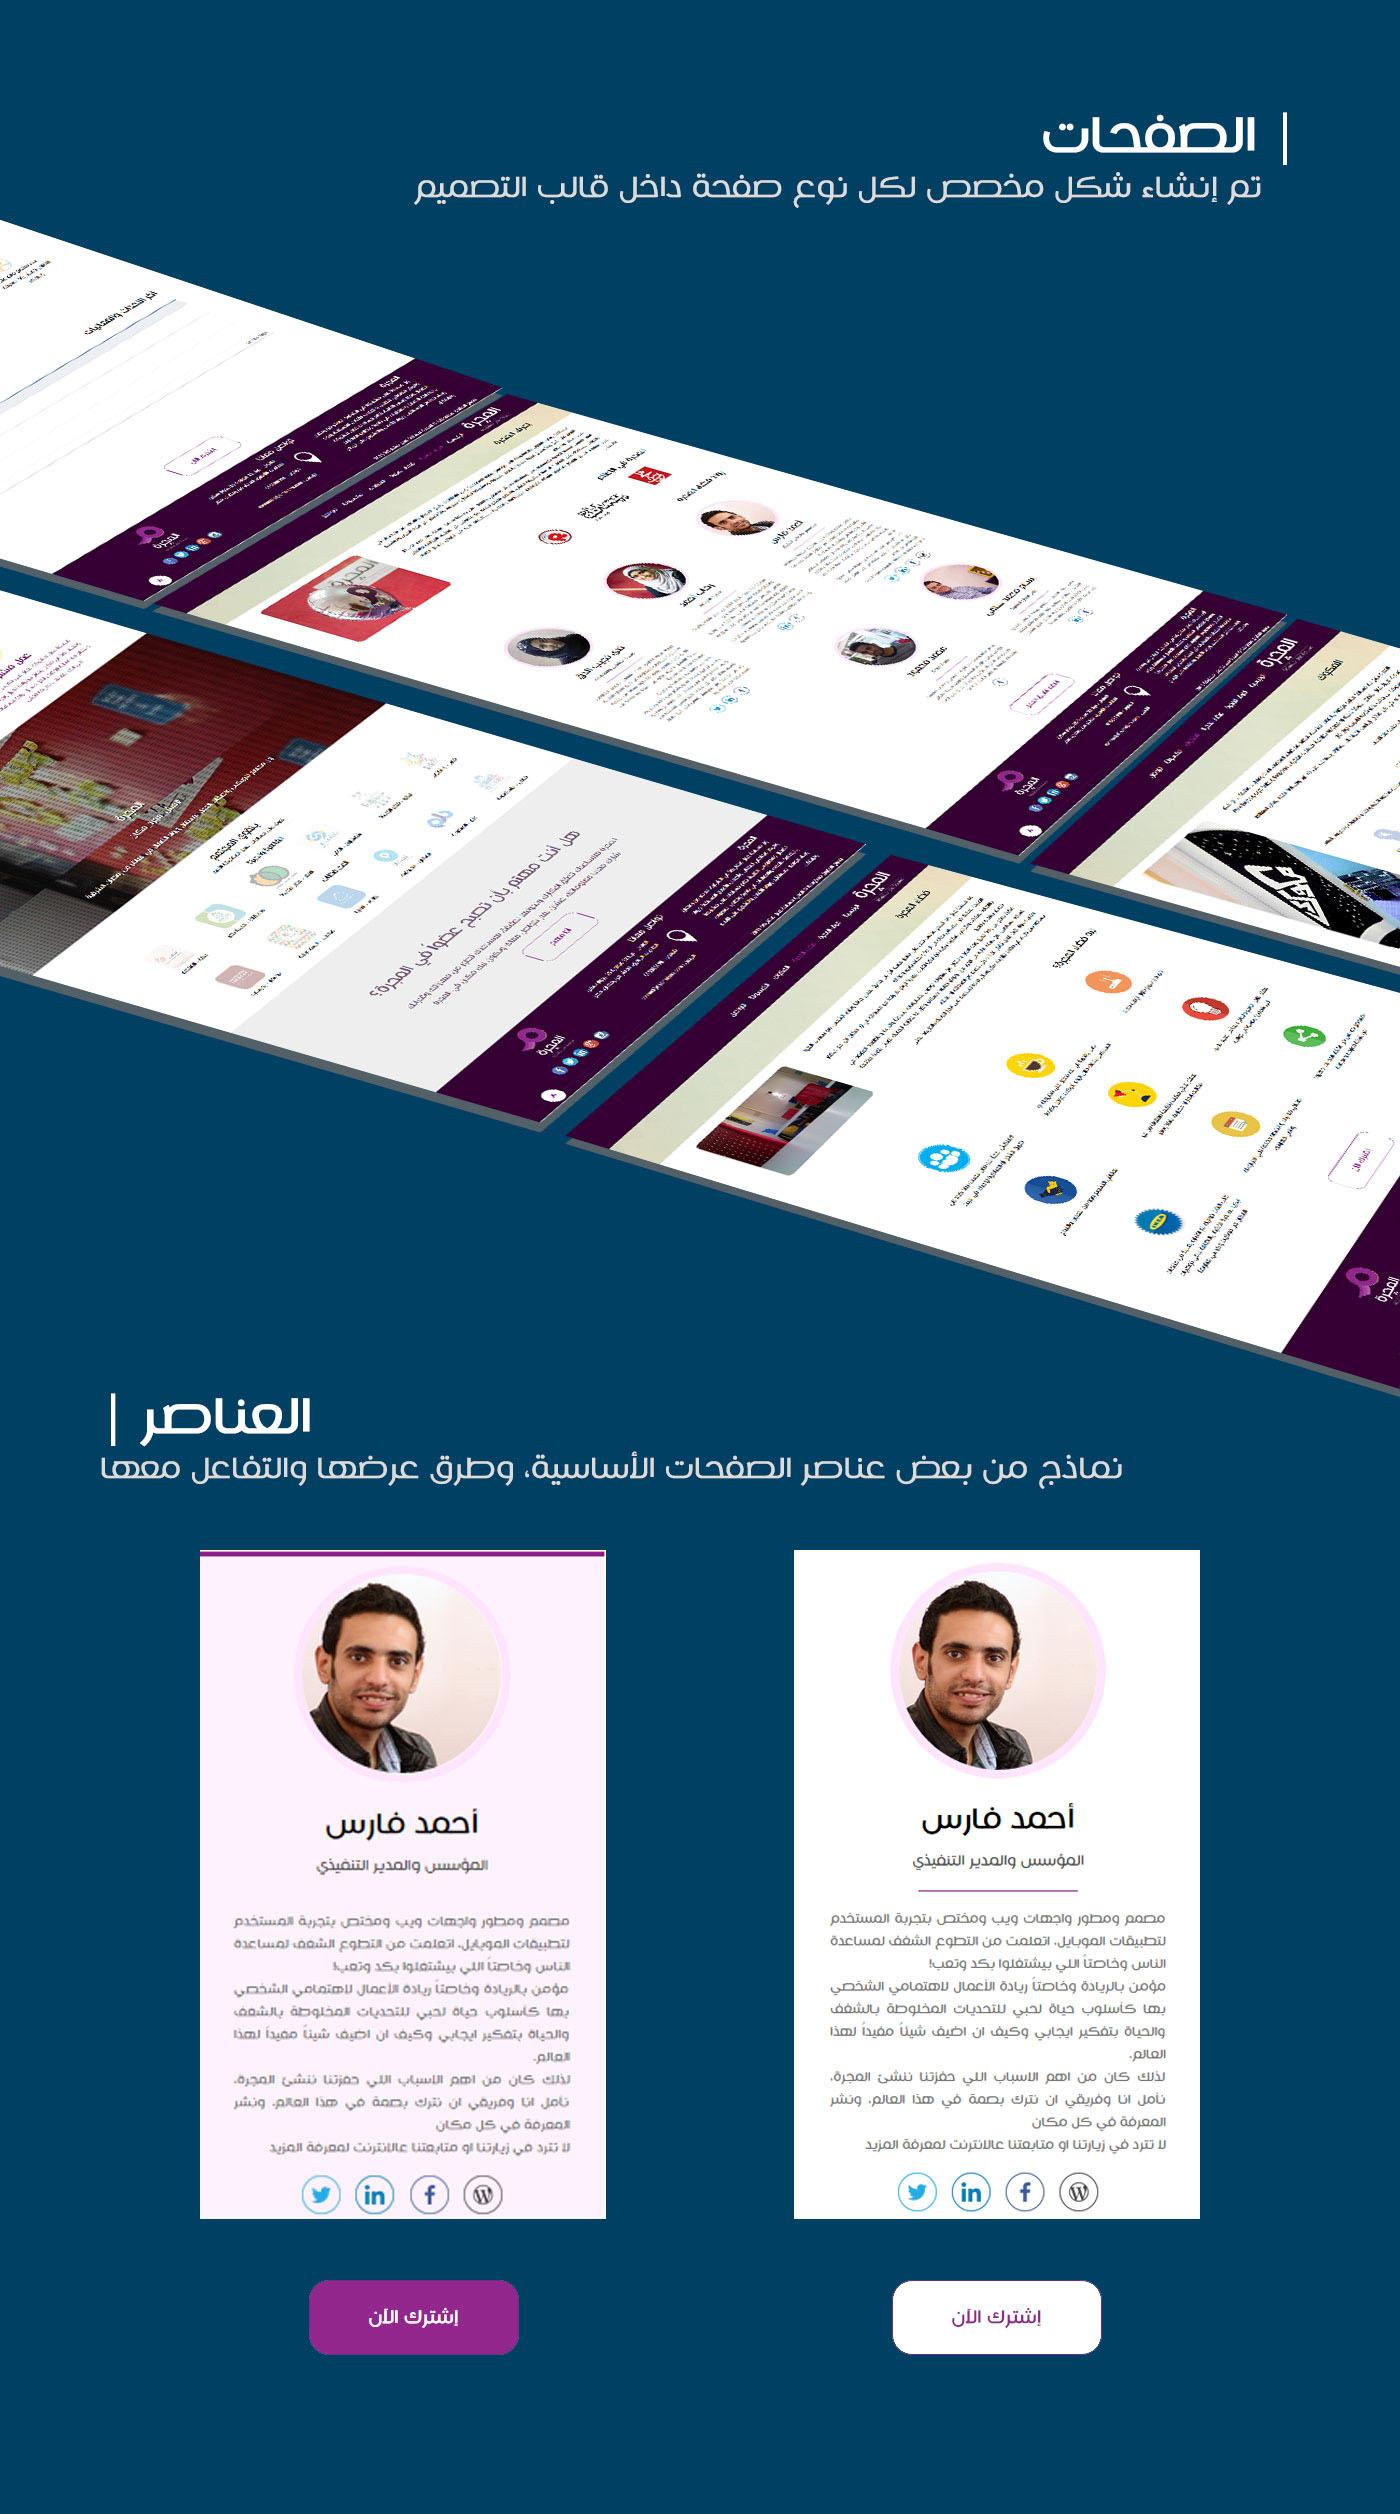 ux,UI,coworking,coworking space,almejarra,ahmed,Faris,design,Web,Website,portal